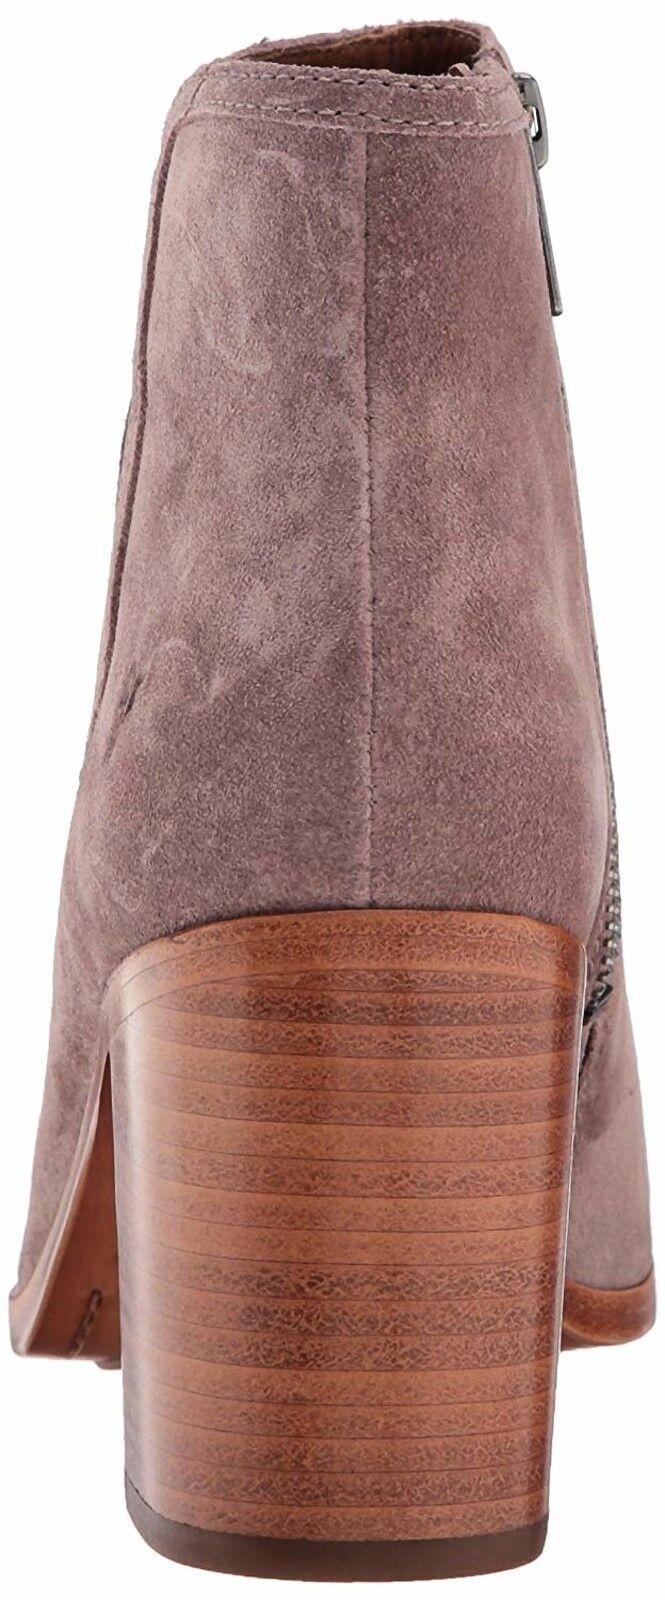 FRYE Damens Danica Peep Toe Bootie 7.5 Stiefel Dusty Rose Suede 7.5 Bootie NEW IN BOX 32df44